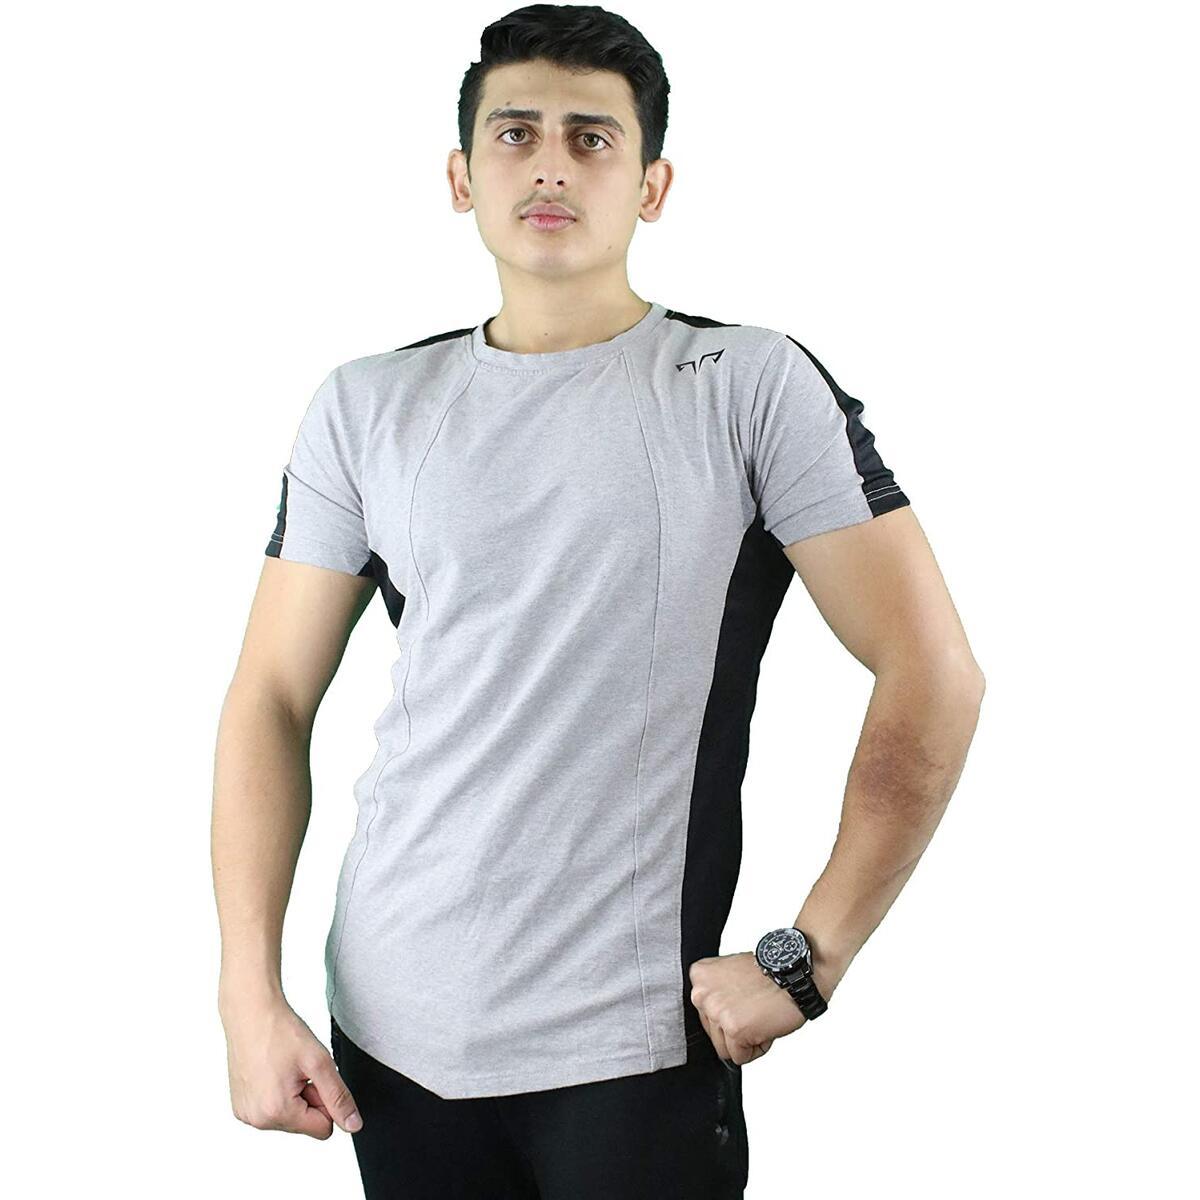 AlphaPro Men Gym Workout Shirt